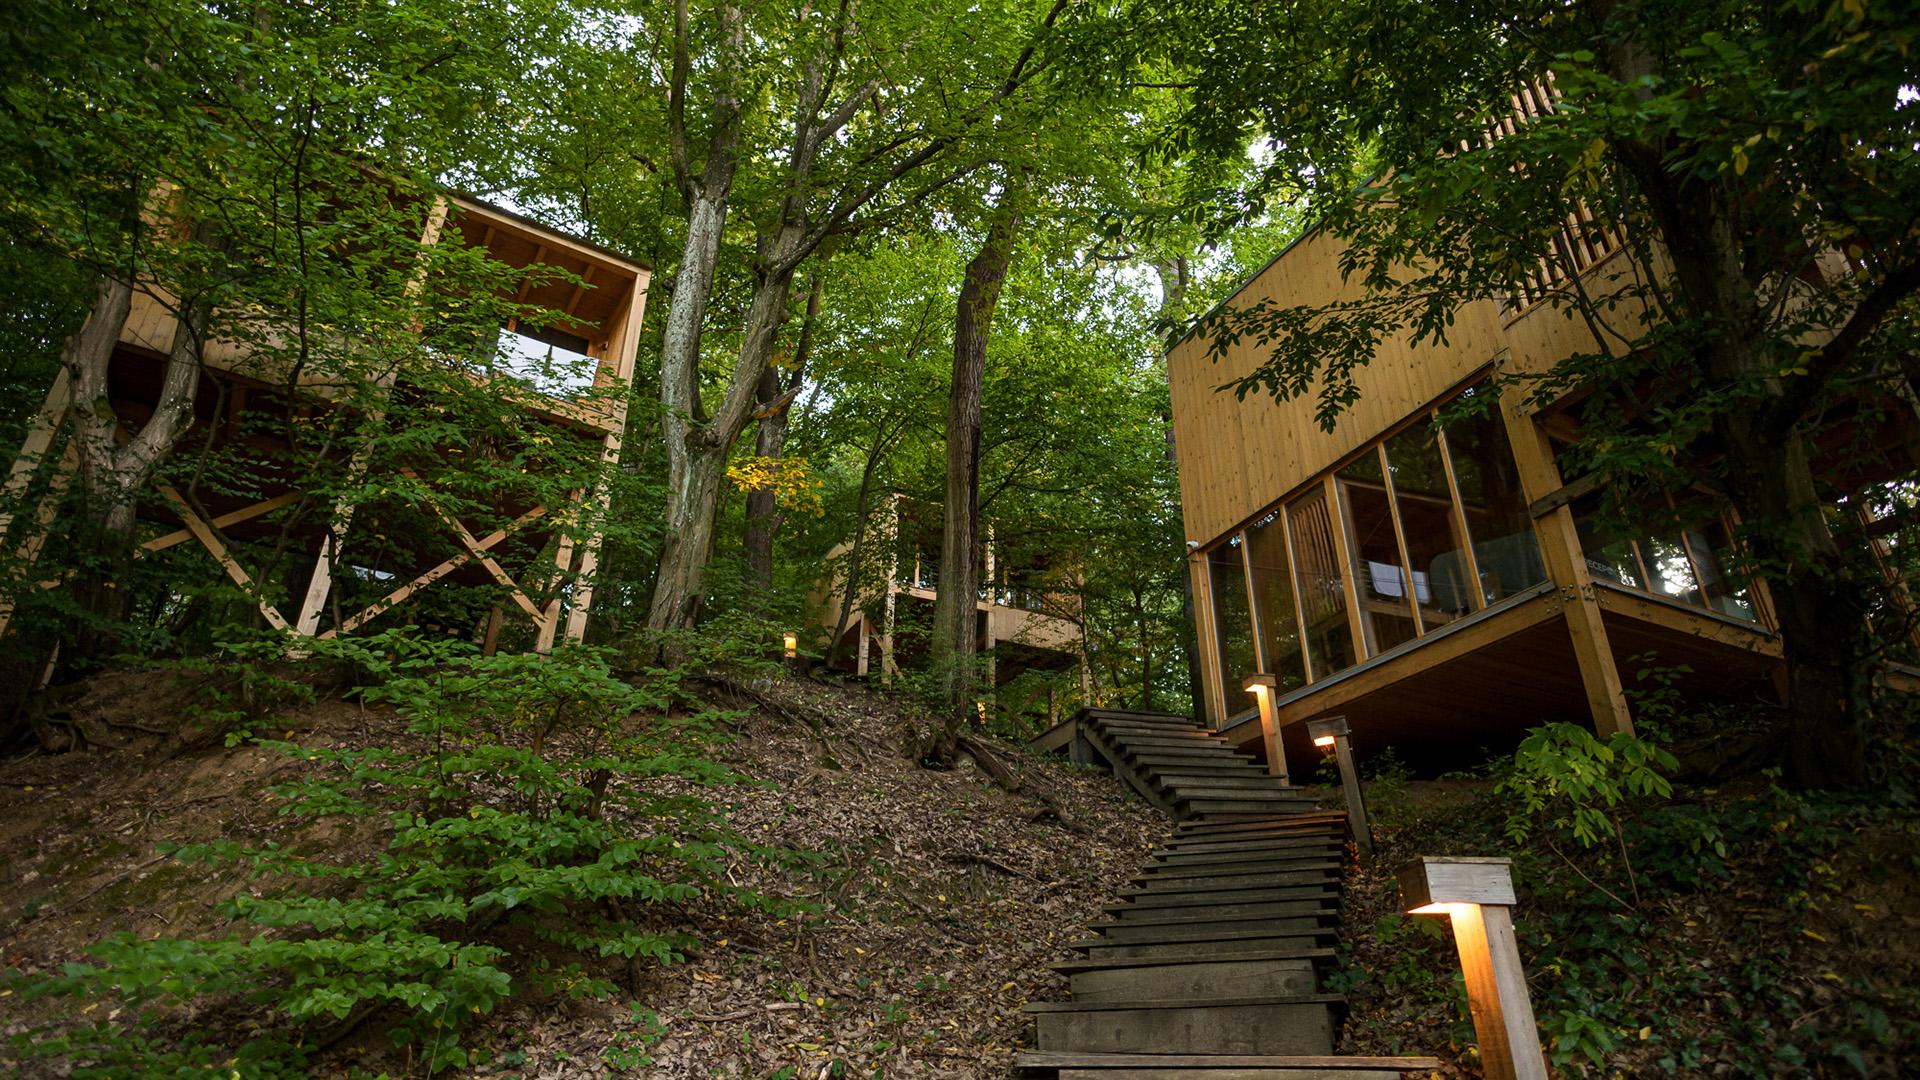 A Treehouses Noszvajon